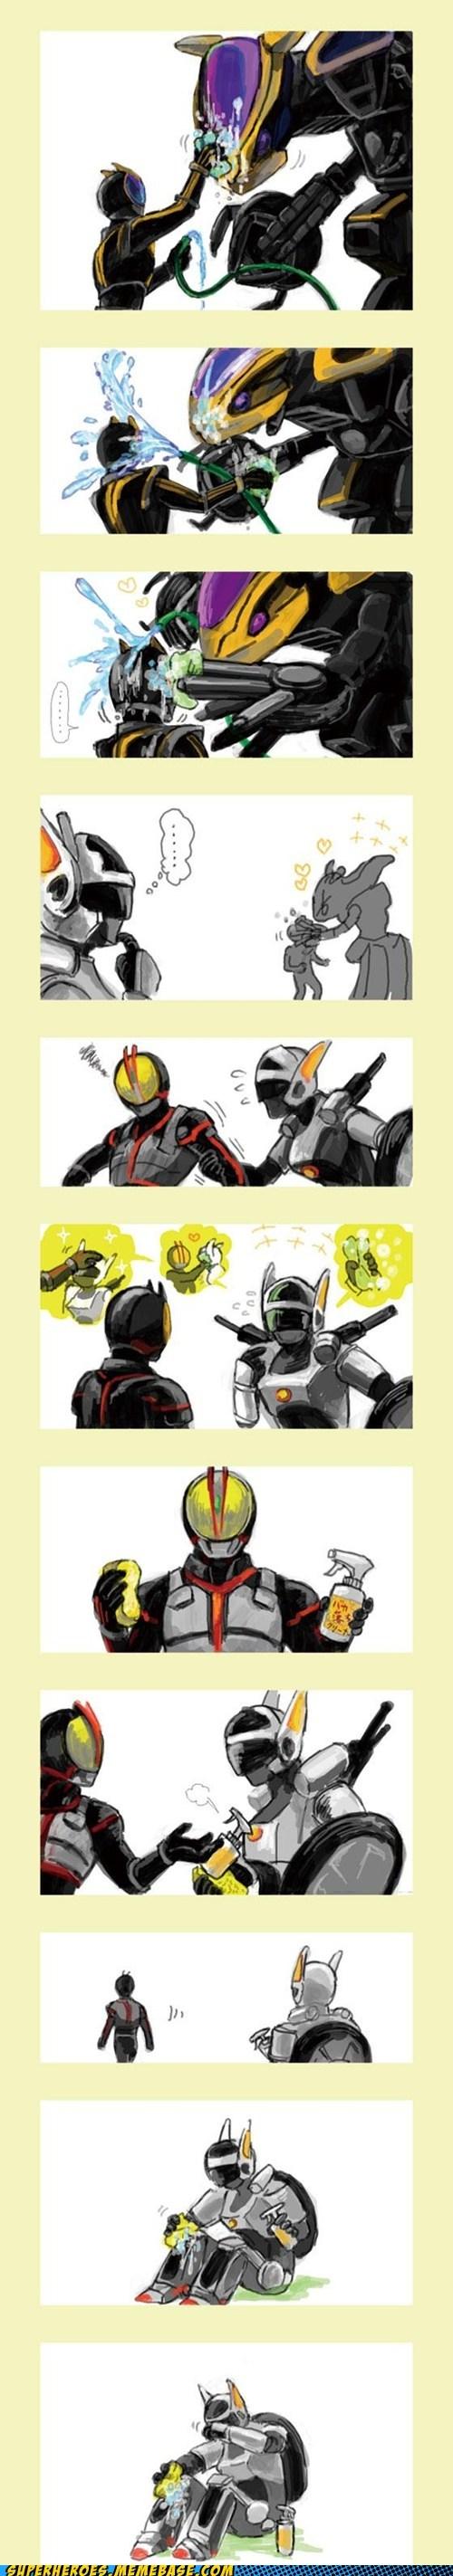 art,robots,love,kamen rider